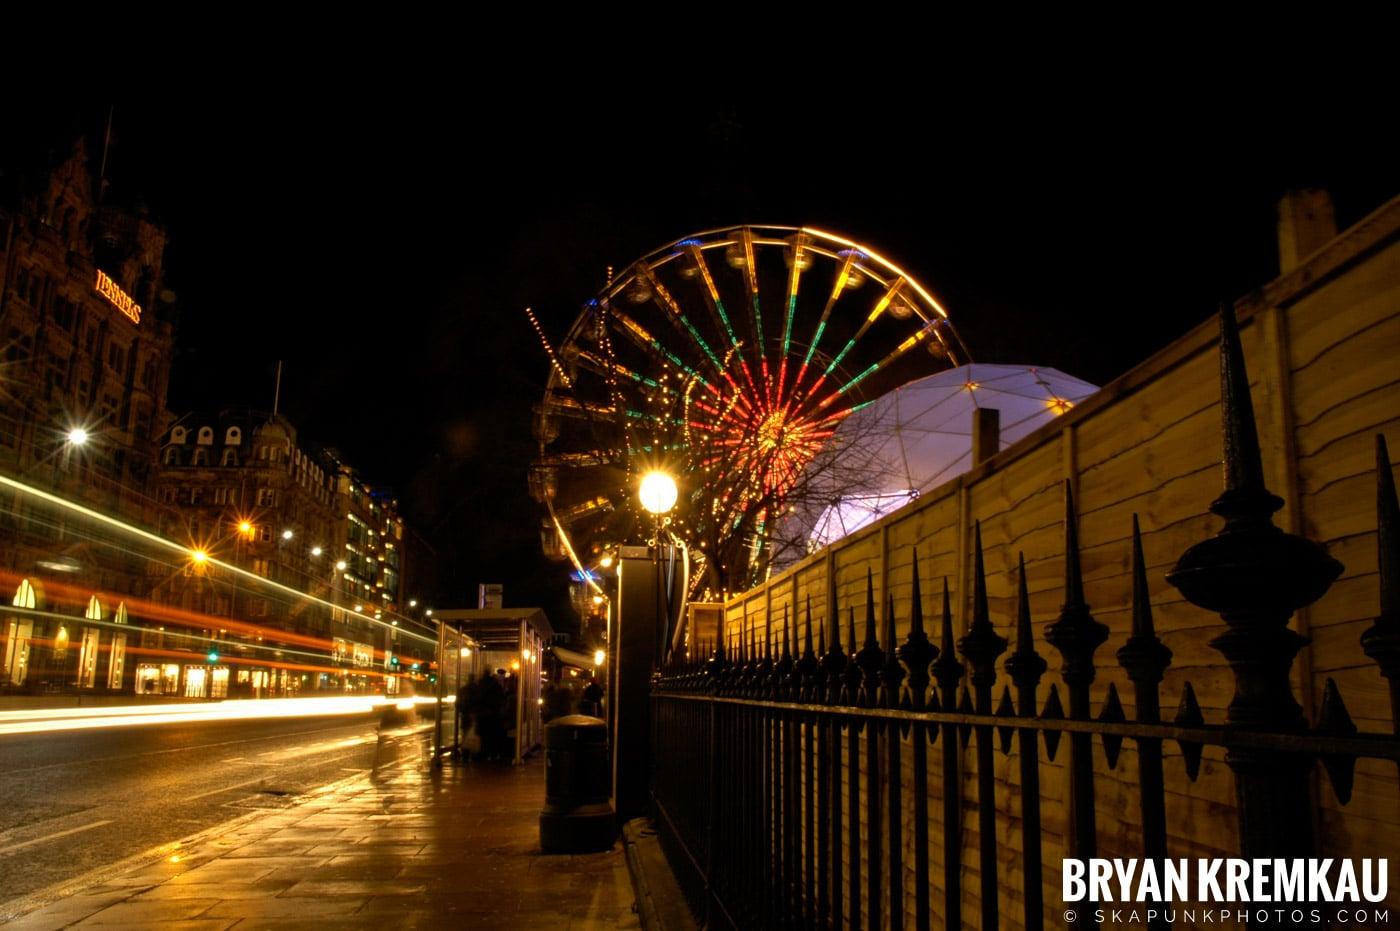 Edinburgh, Scotland - Day 1 - 12.12.06 (6)